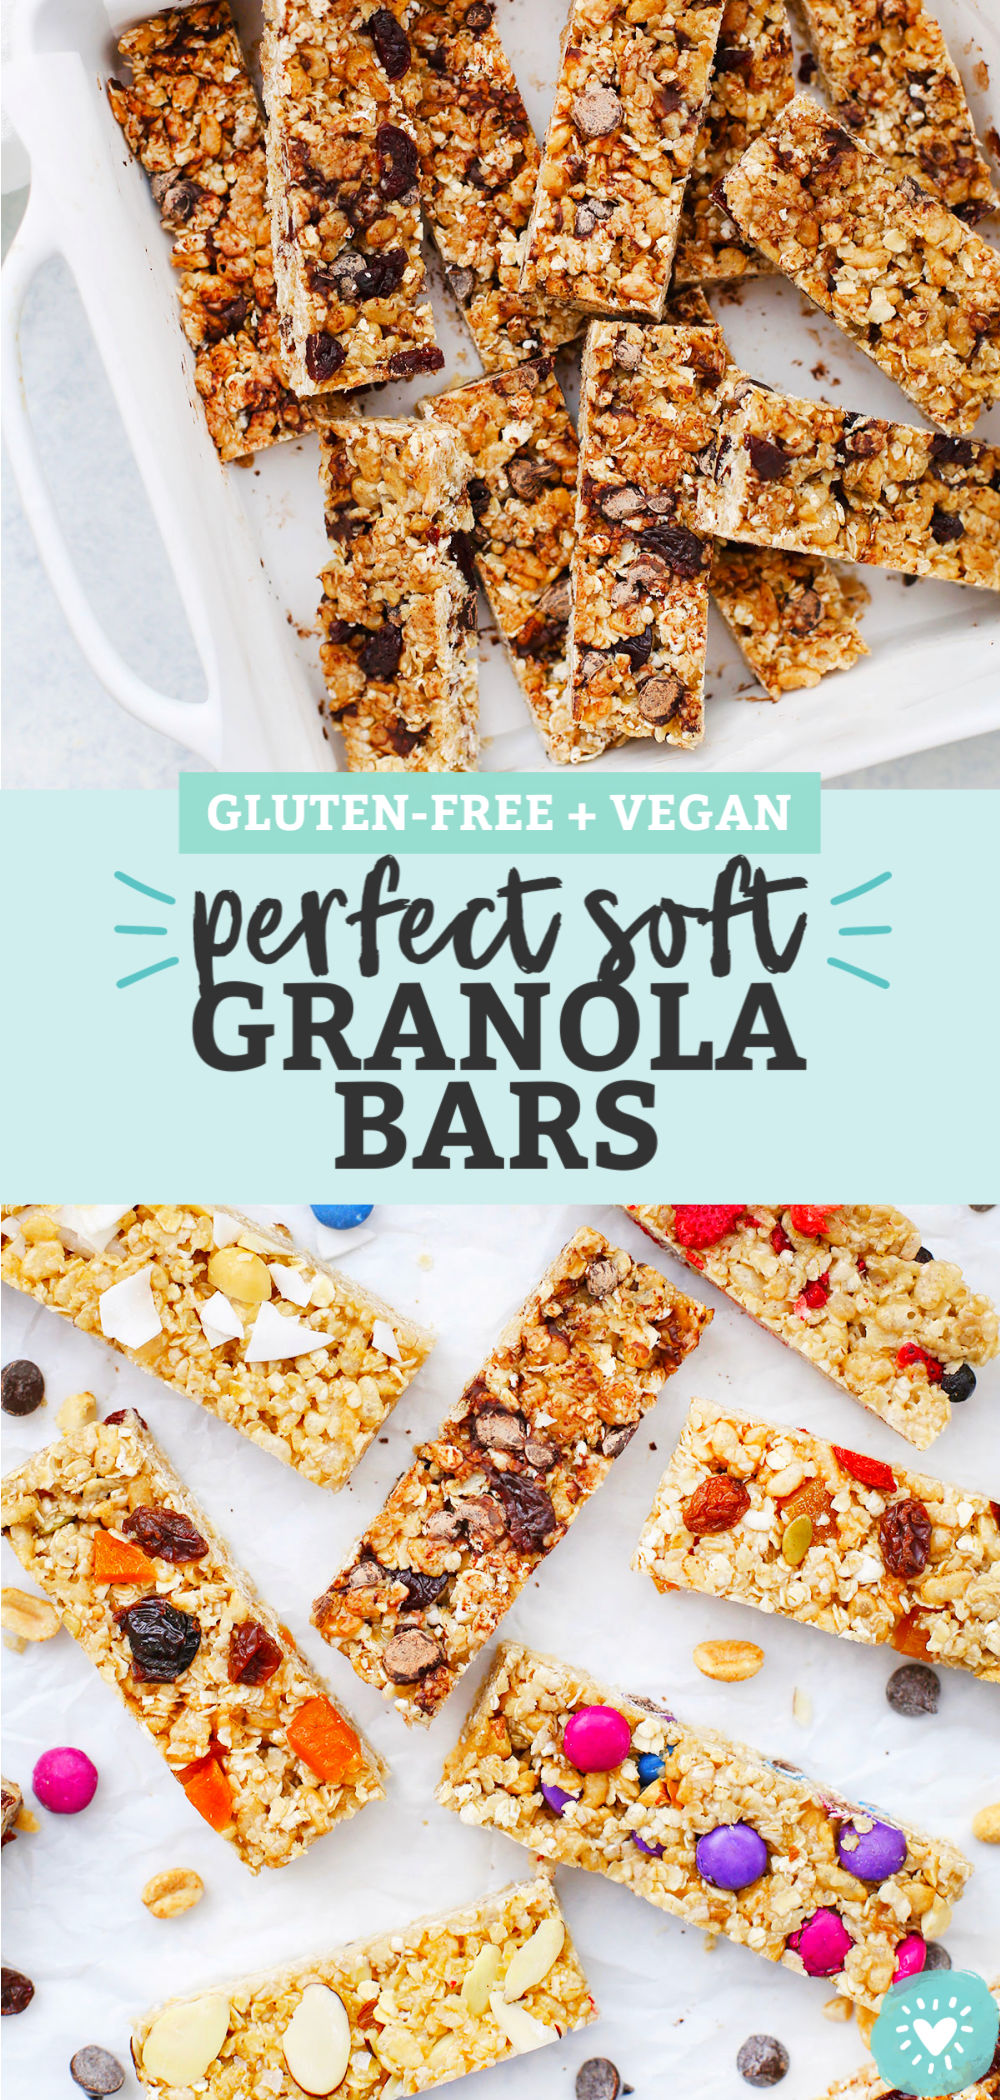 Homemade Soft Granola Bars from One Lovely Life